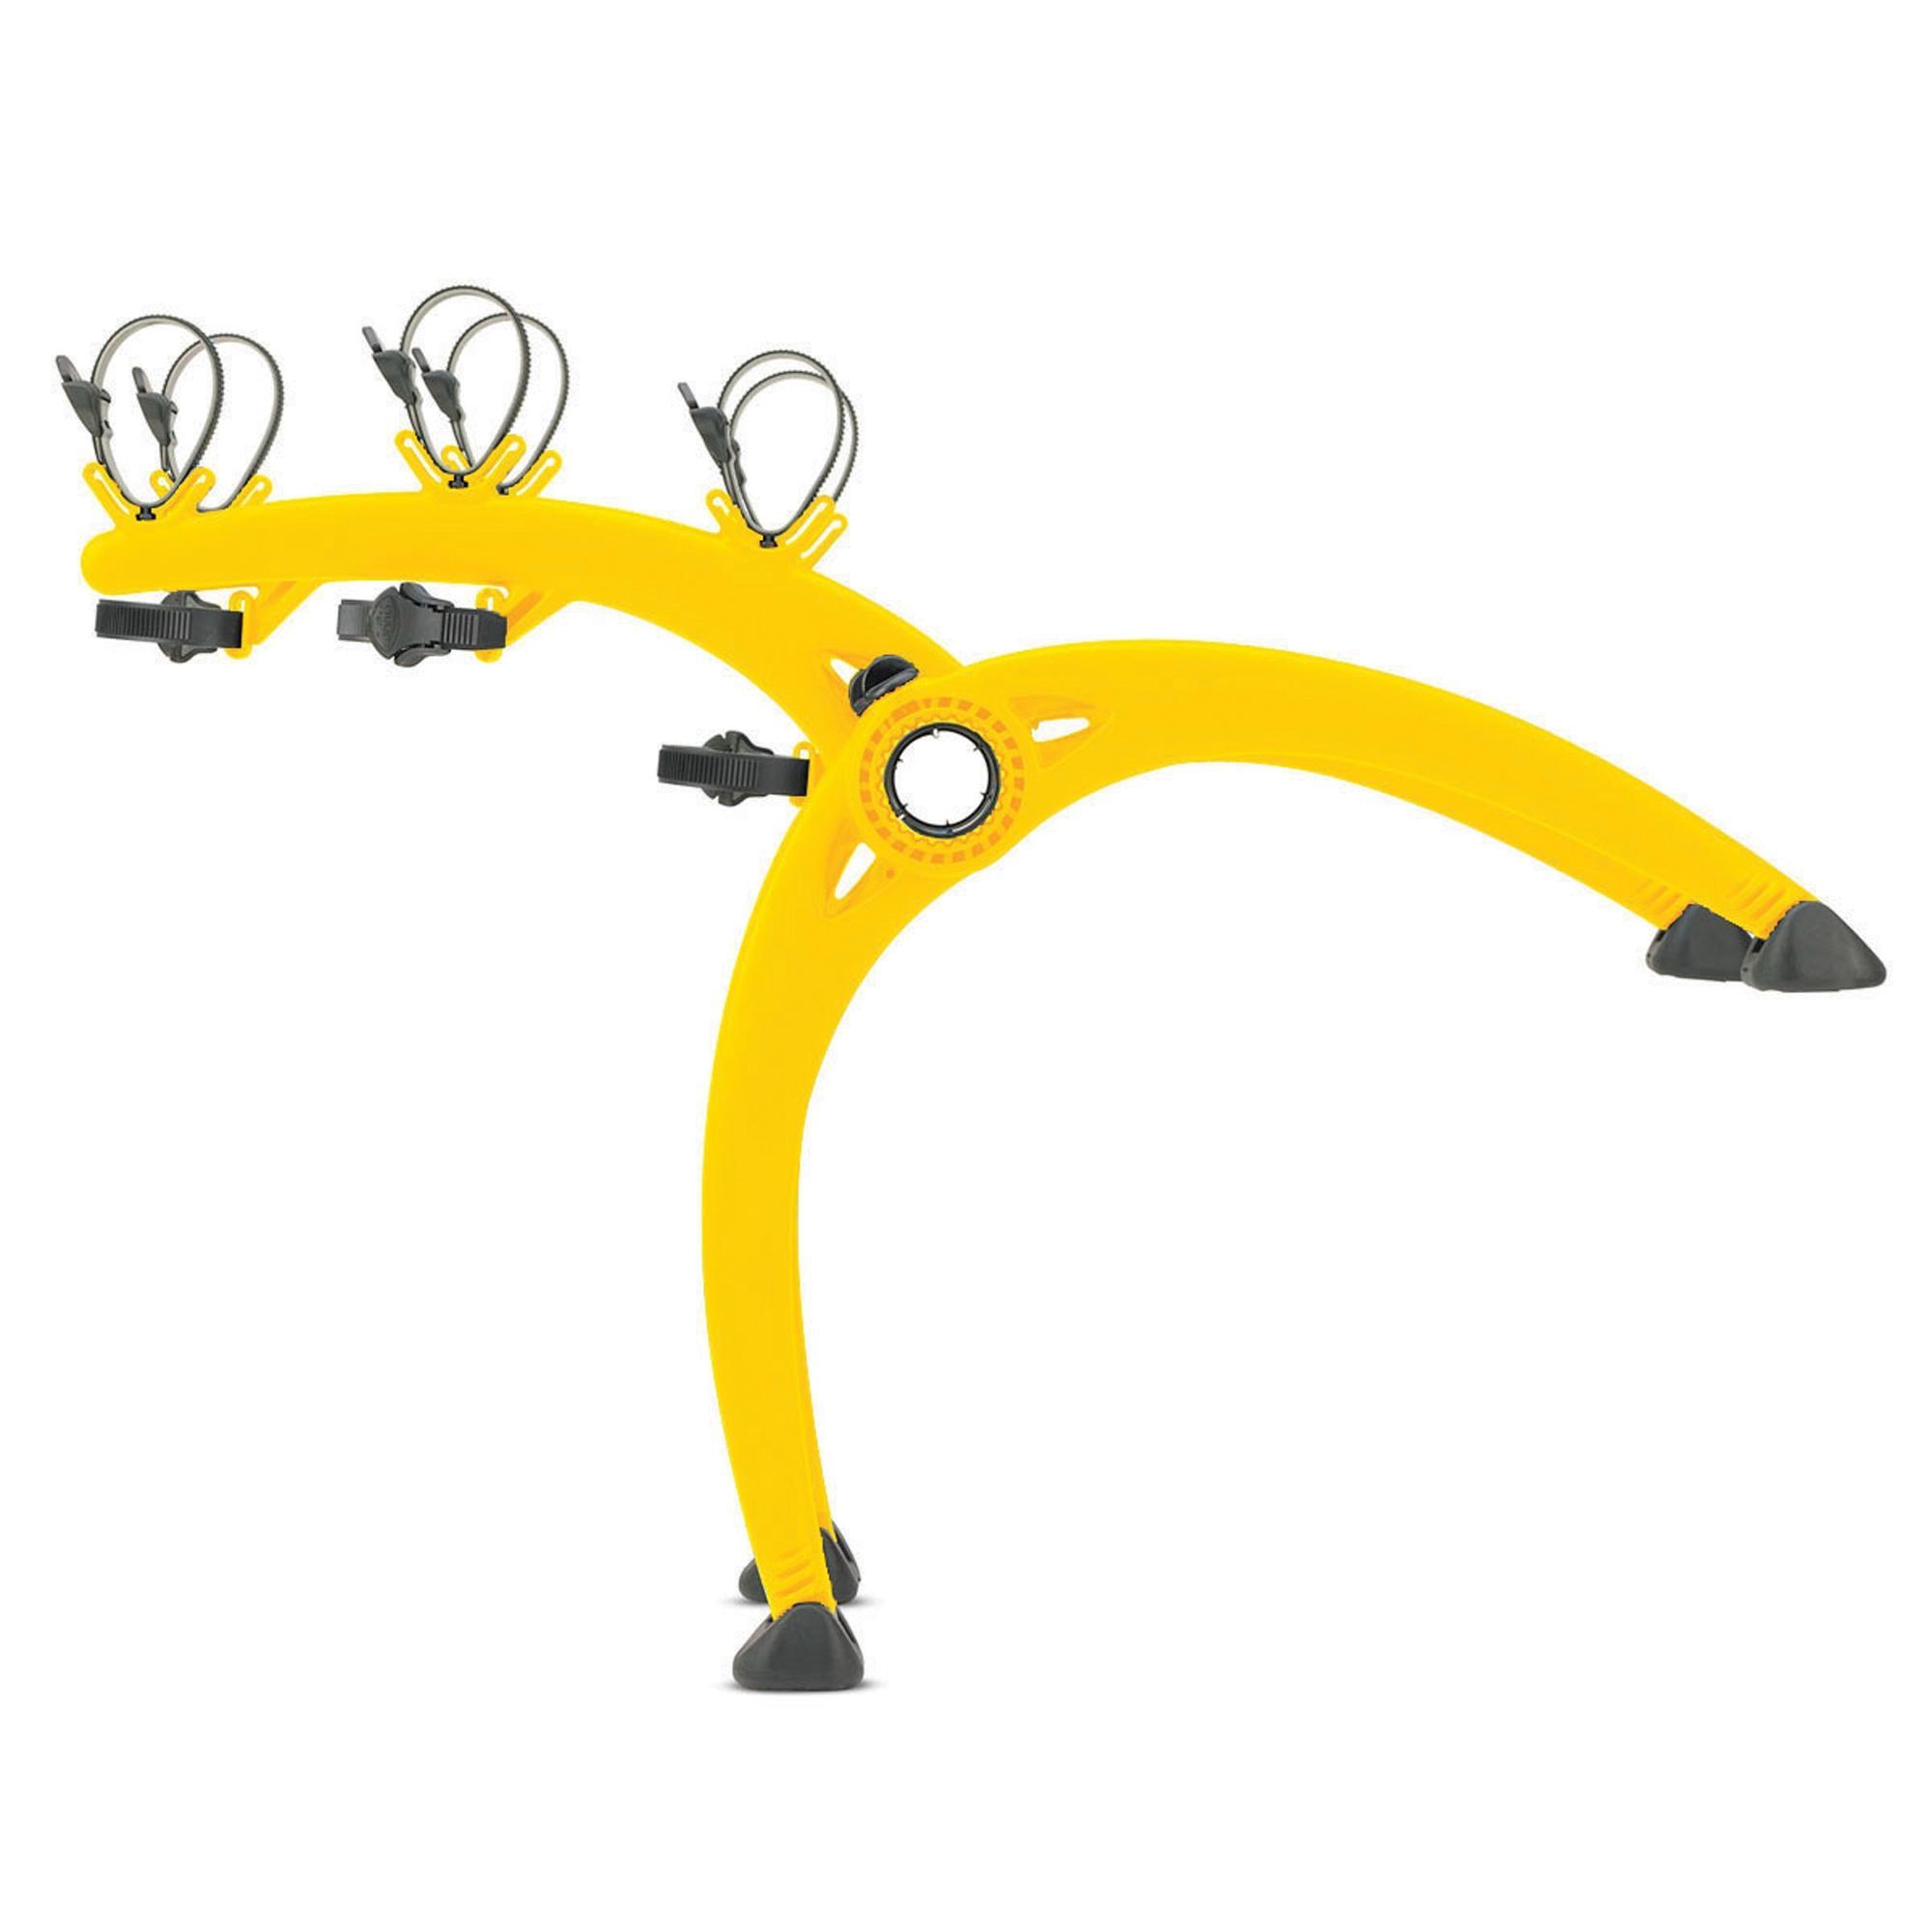 Image of Saris Bones Yellow 3 Bike Rear Cycle Carrier